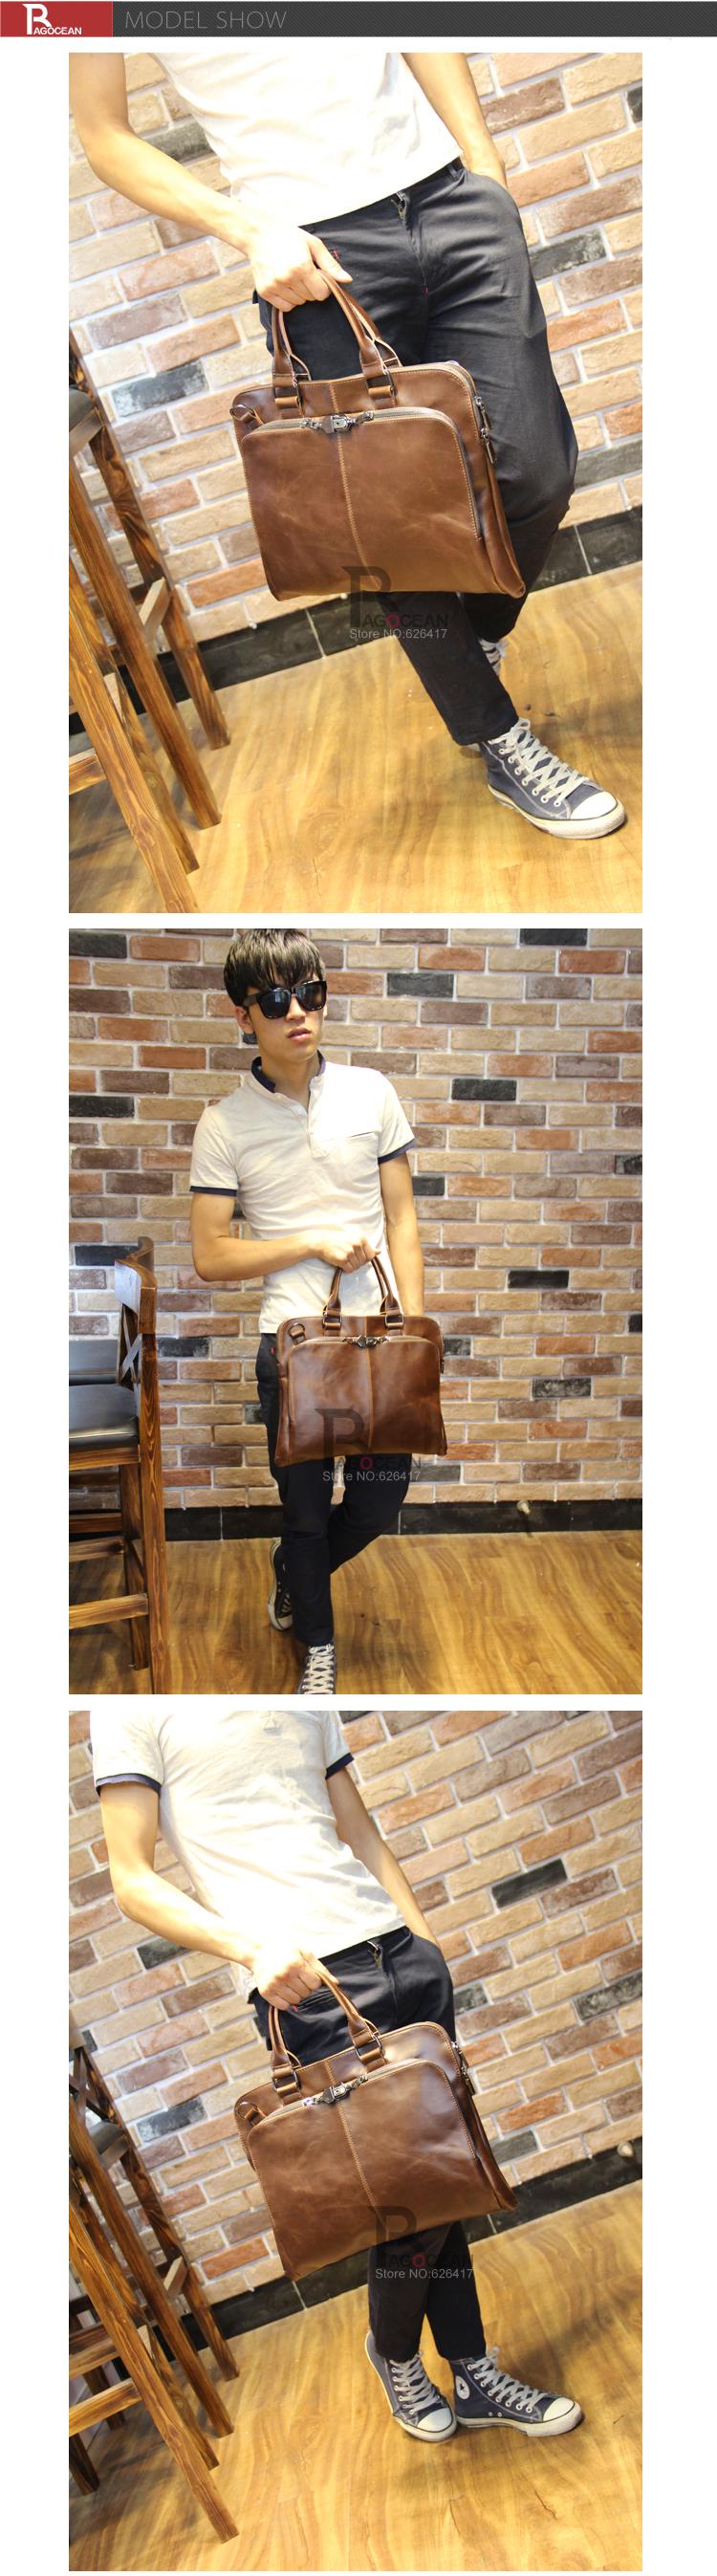 "New high quality pu leather Shoulder leisure men's bag business messenger portable briefcase Laptop large Purse 14"" Handbag 6"